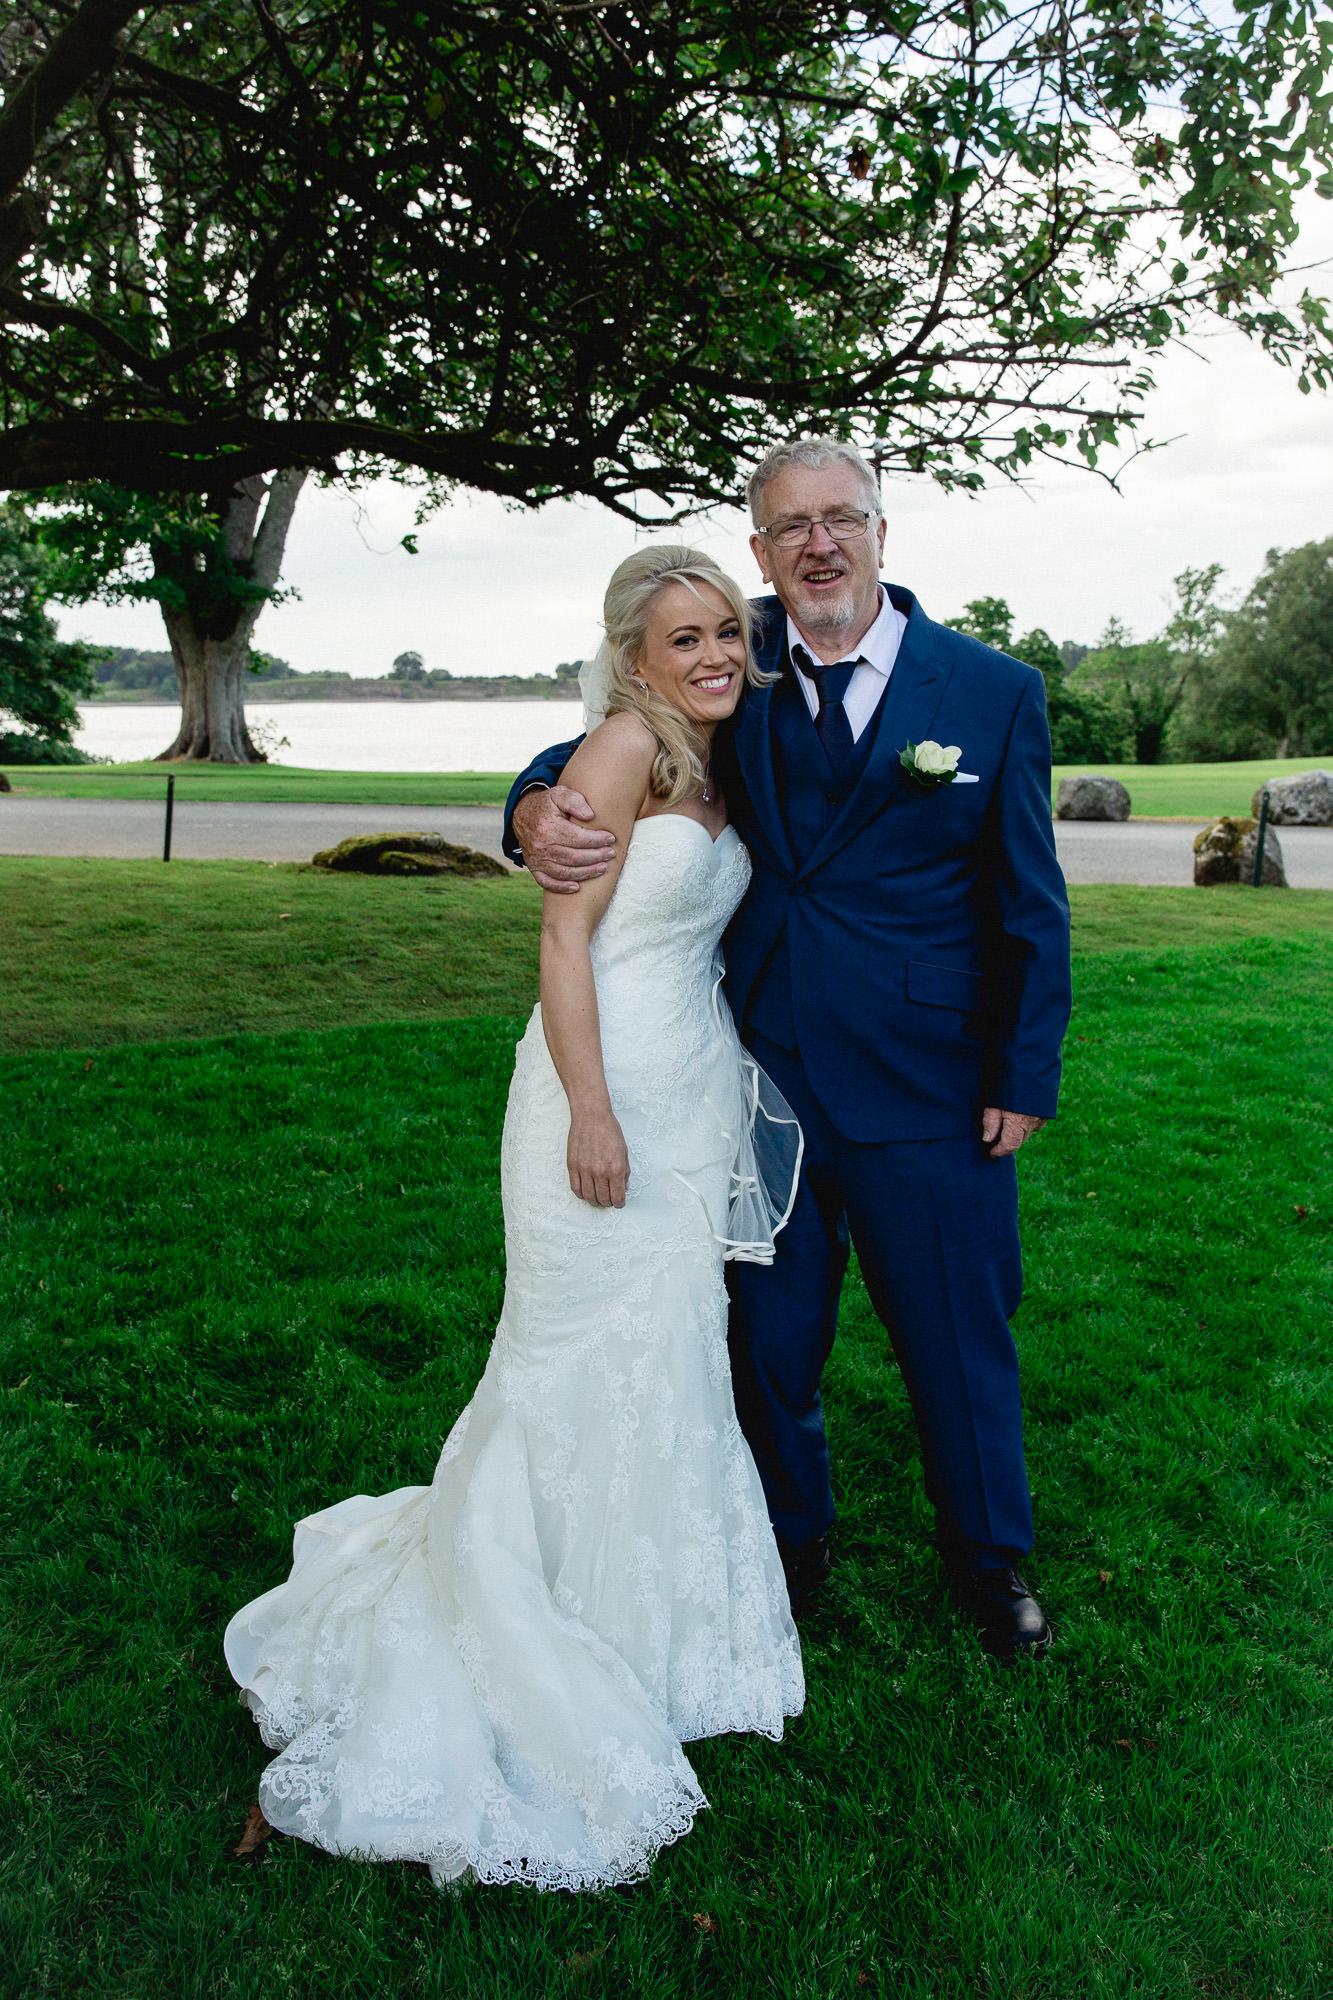 CLAIREBYRNEPHOTOGRAPHY-WEDDING-Ireland-tulffaris-alternative-fun-Lisa-terry-32.jpg